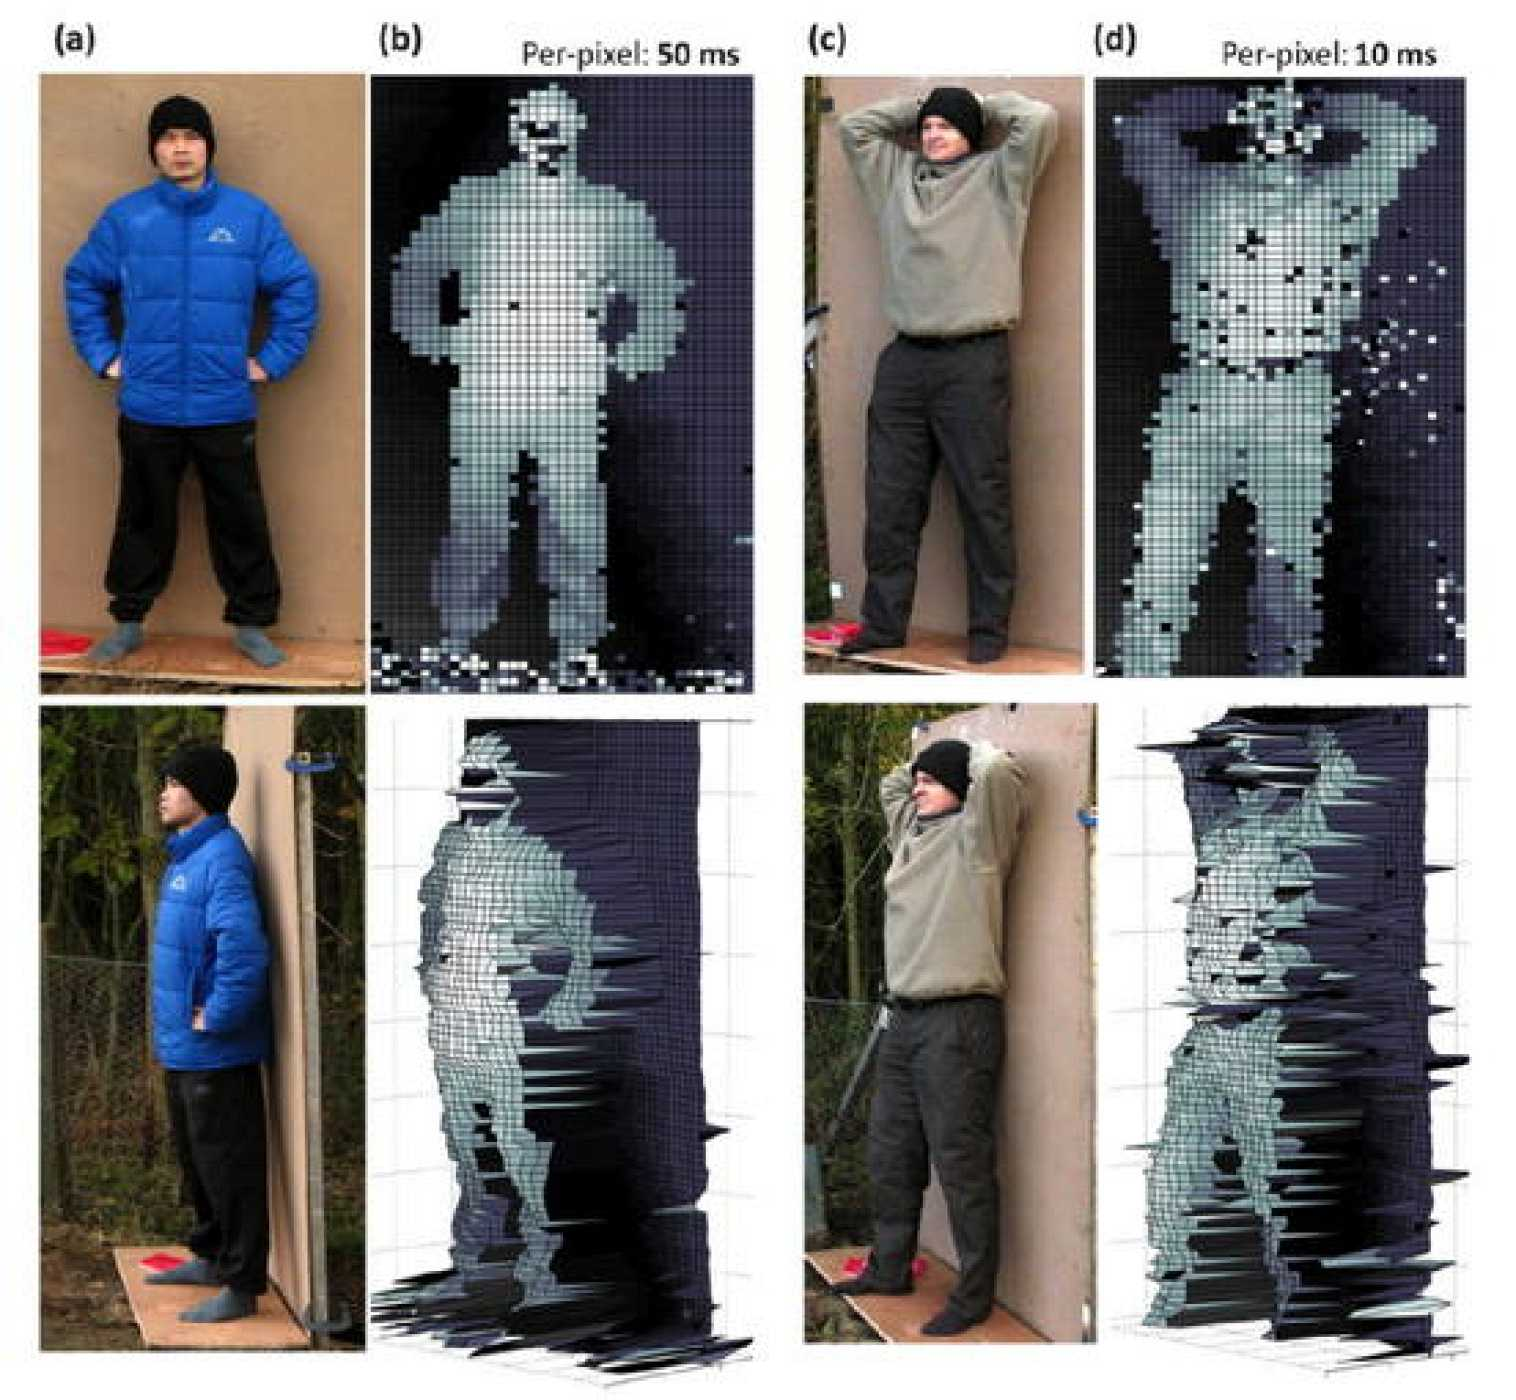 La imagen muestra a la persona en forma de píxeles 3-D